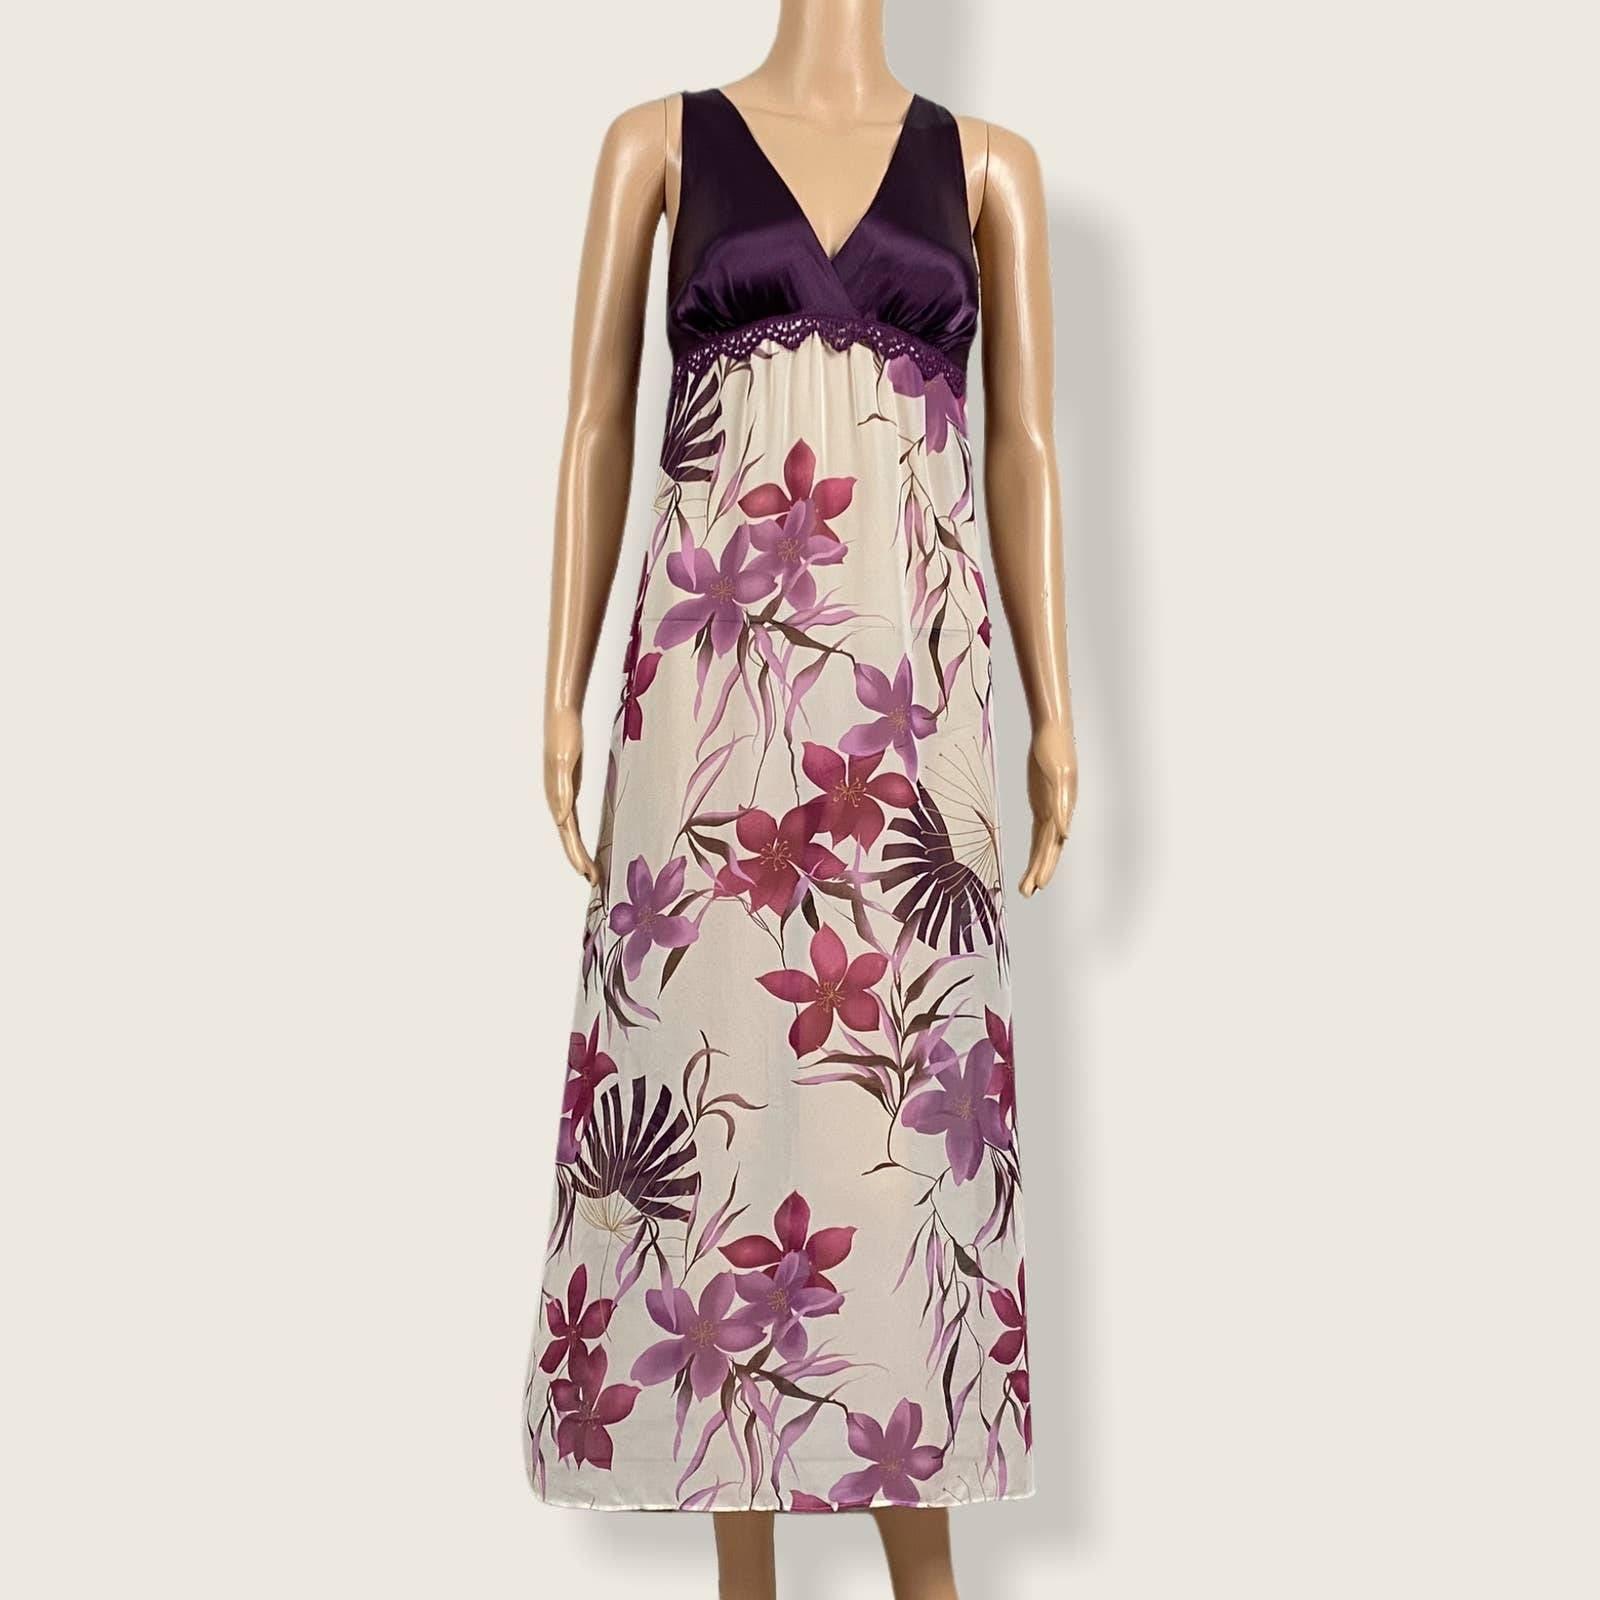 Gilligan & O'Malley Floral Nightgown